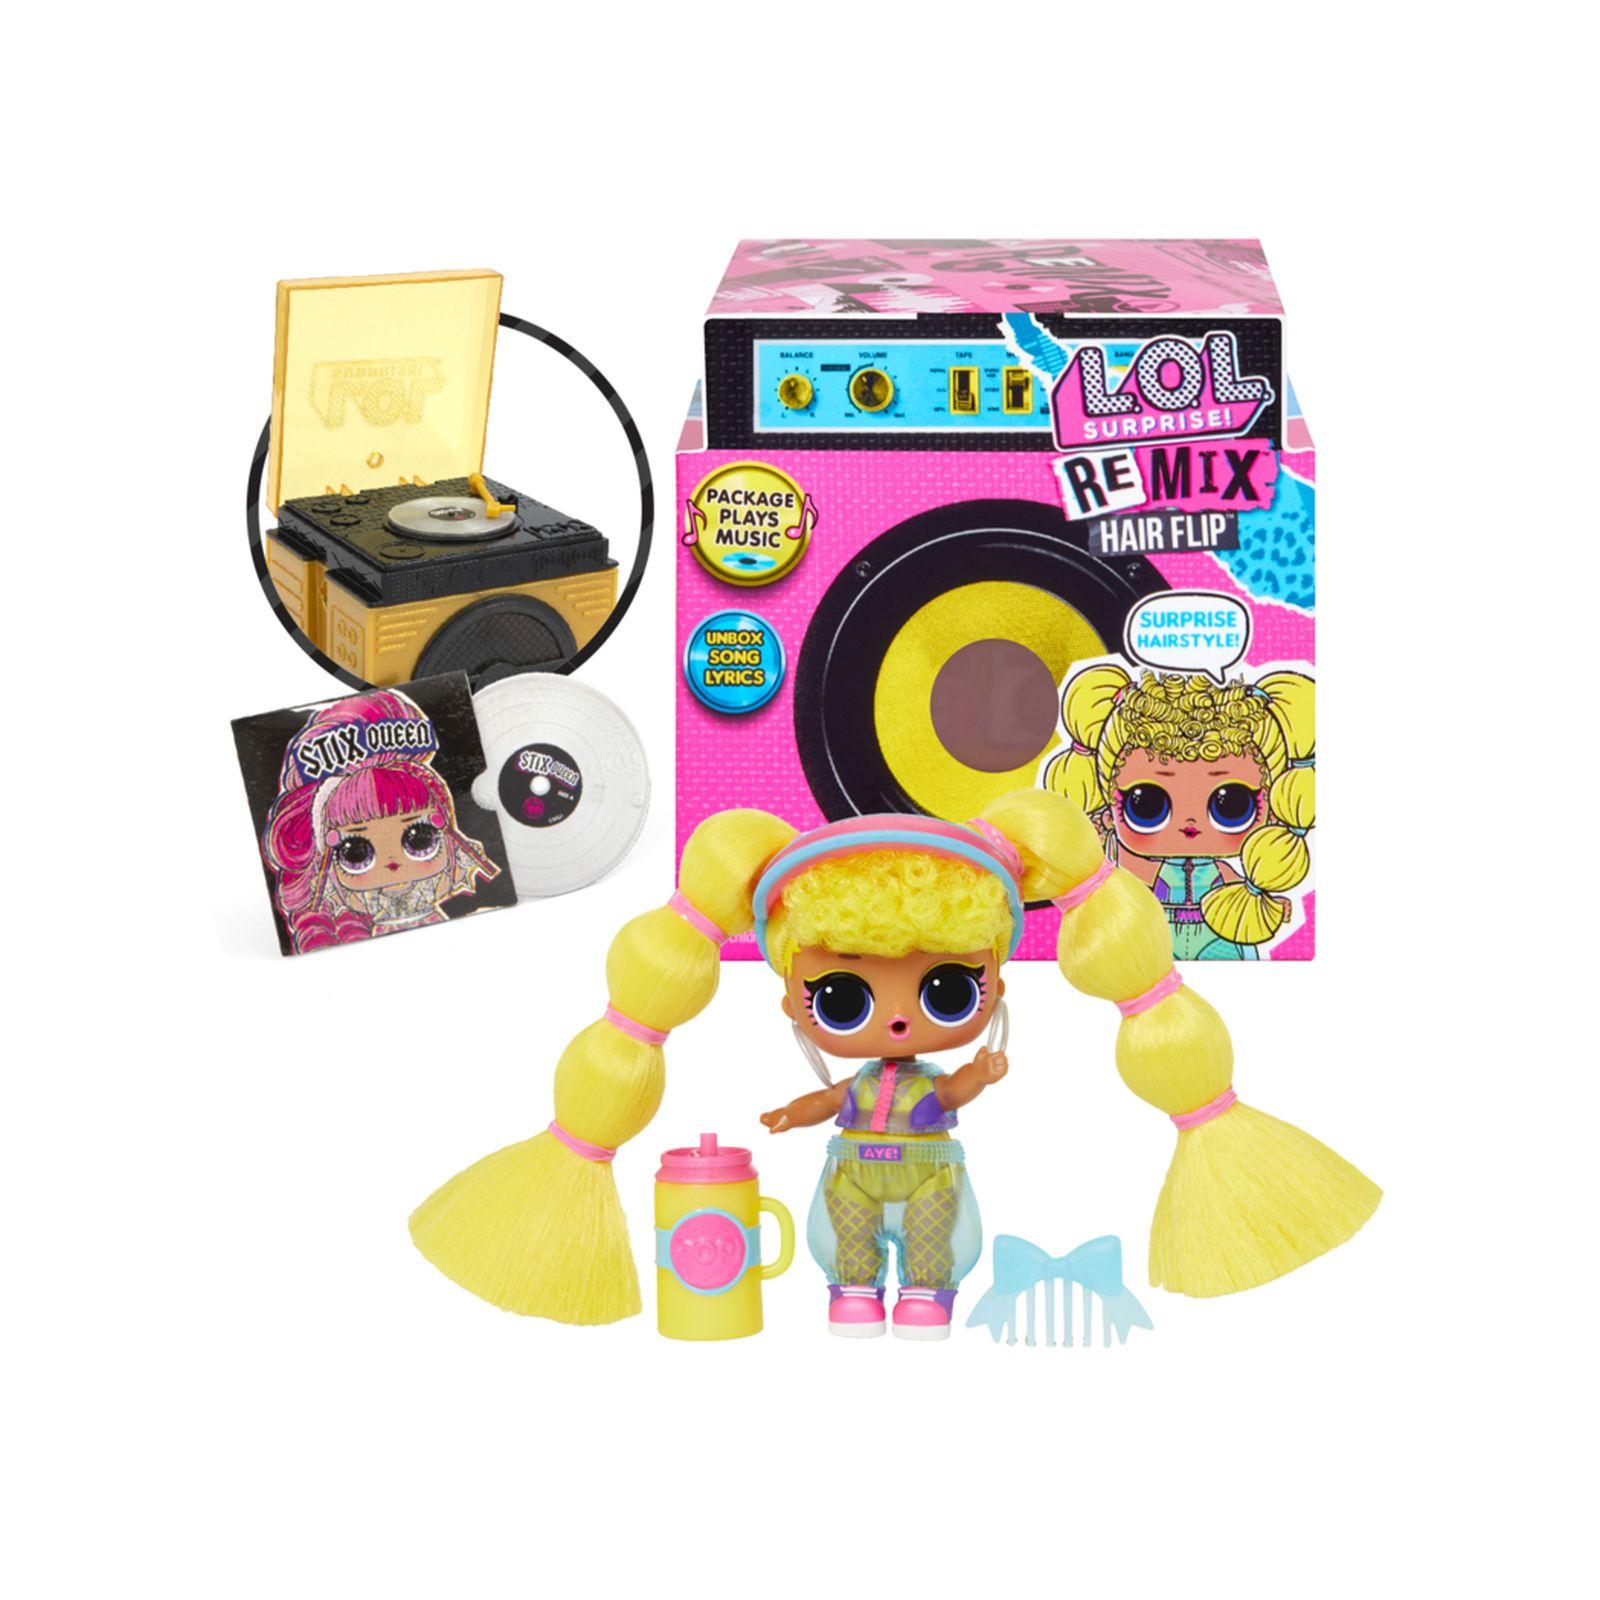 Lol remix hairflip - LOL